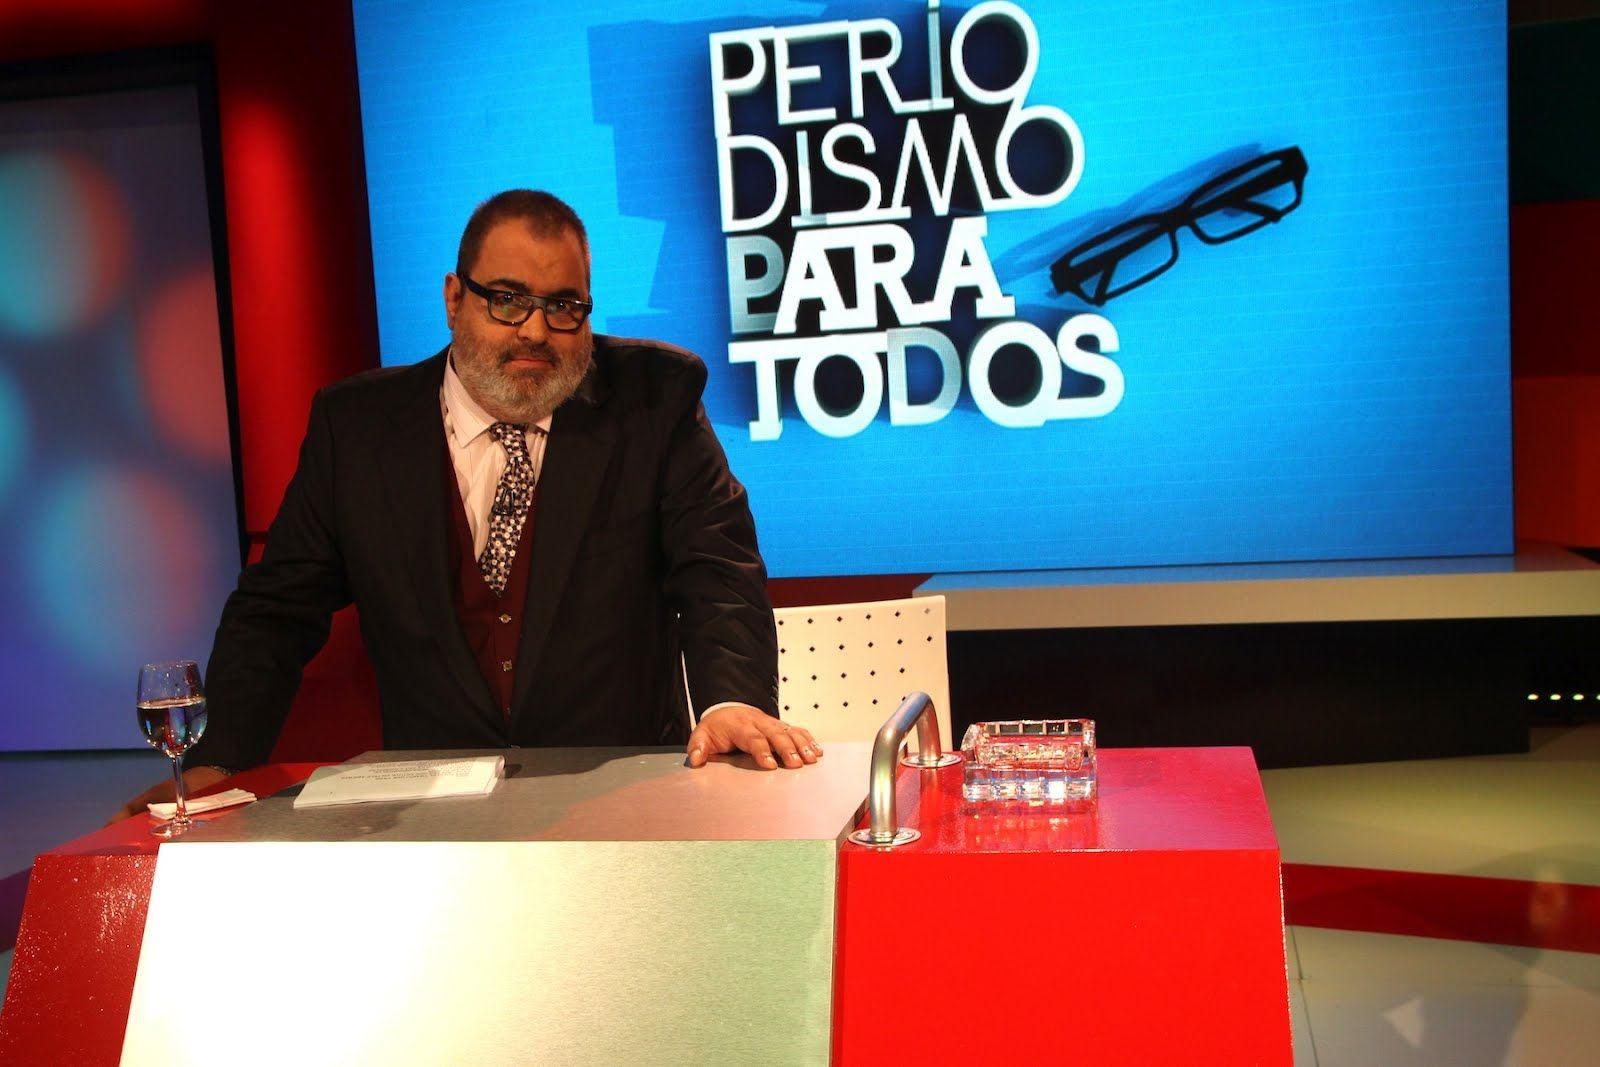 Lanata le pidió disculpas públicas a Alejandro Fantino esta mañana